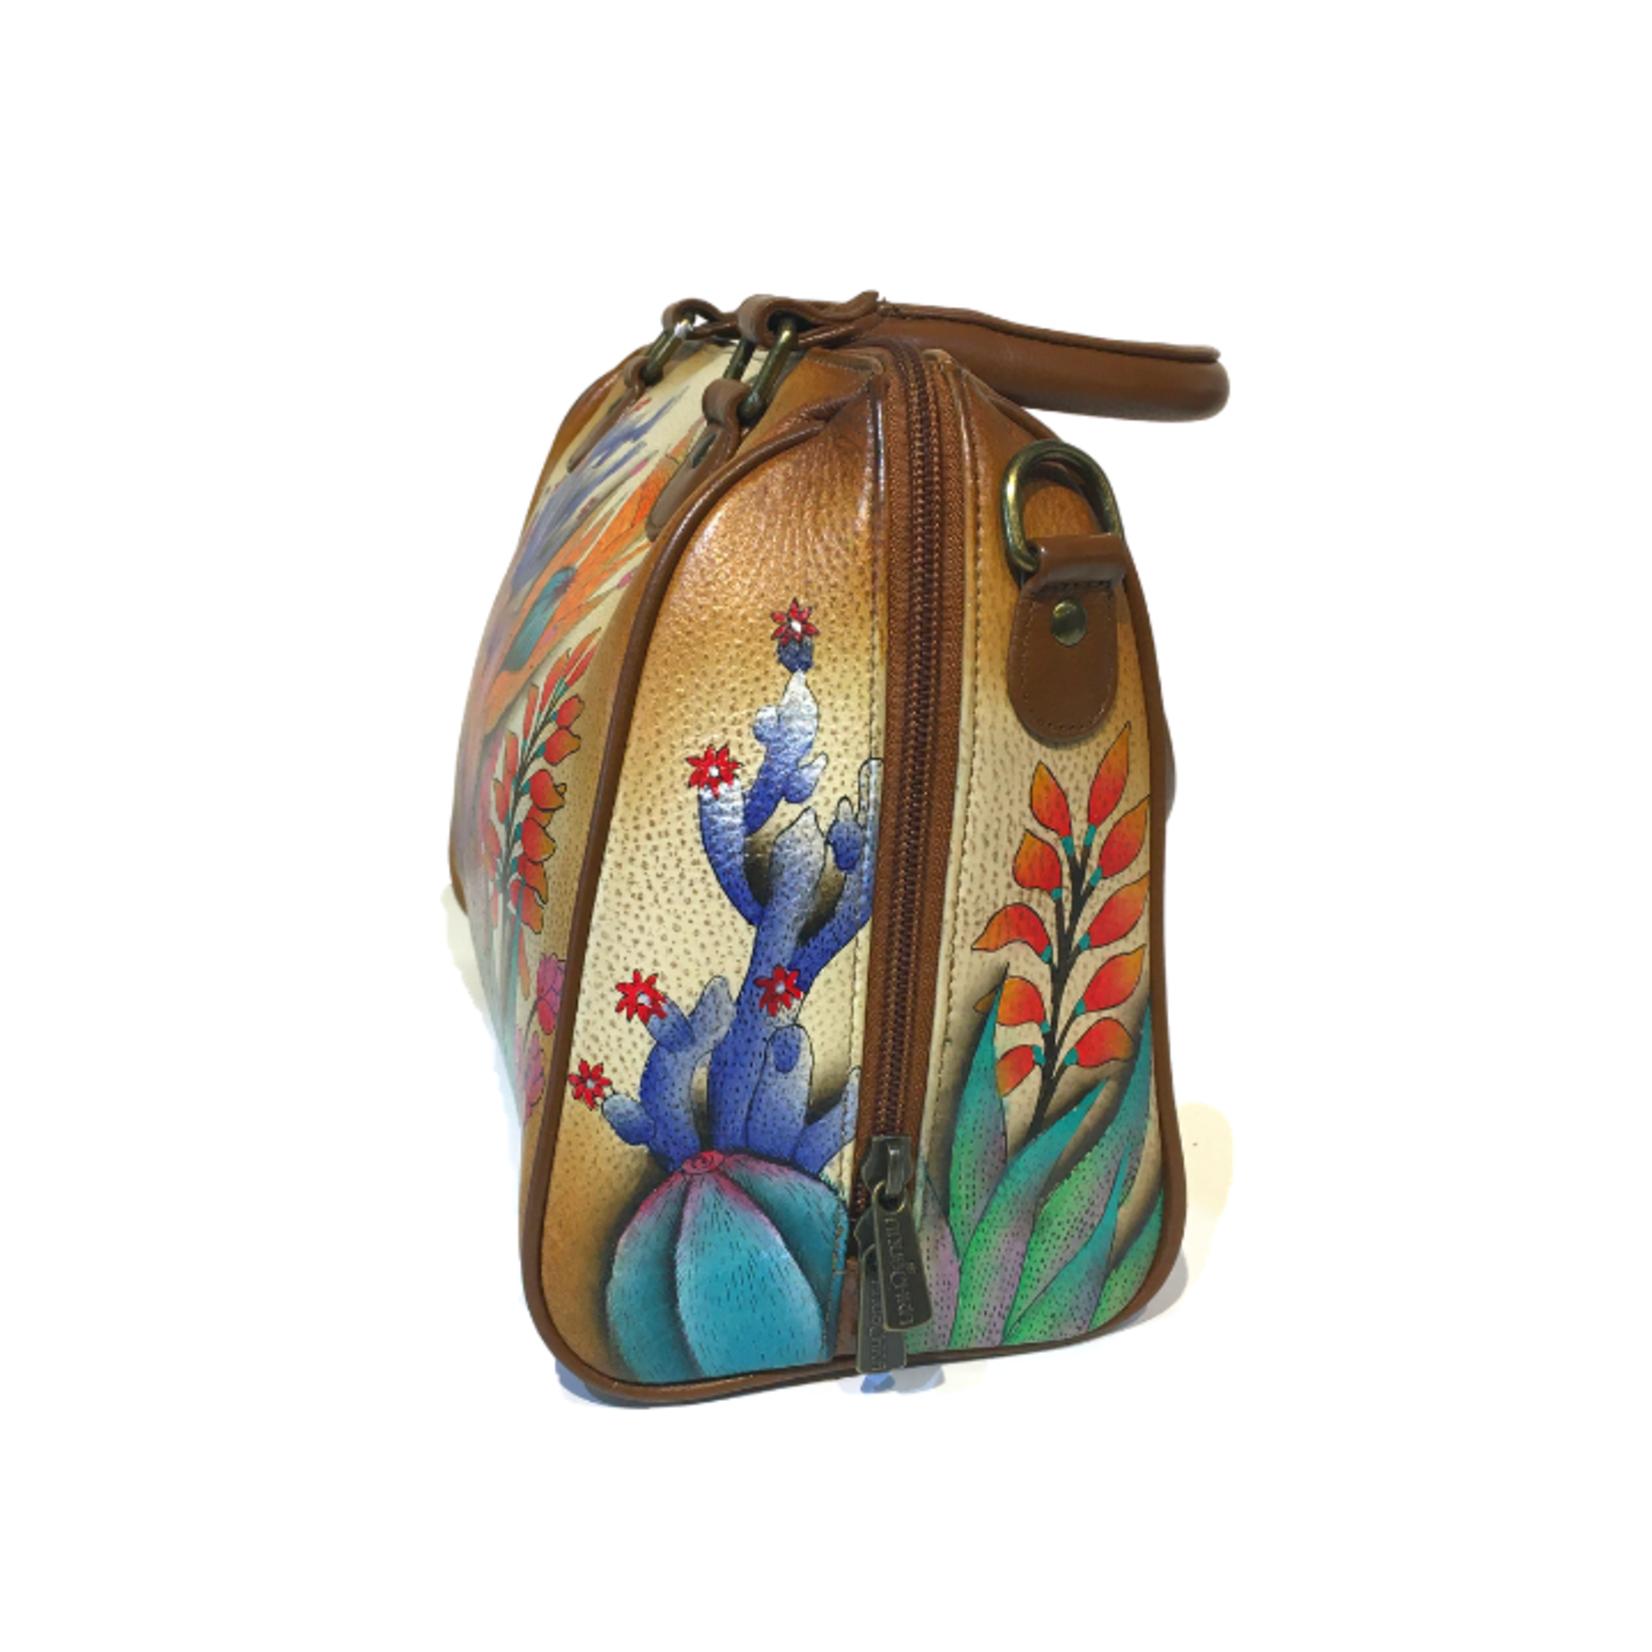 Anuschka 625 dts zip around handbag